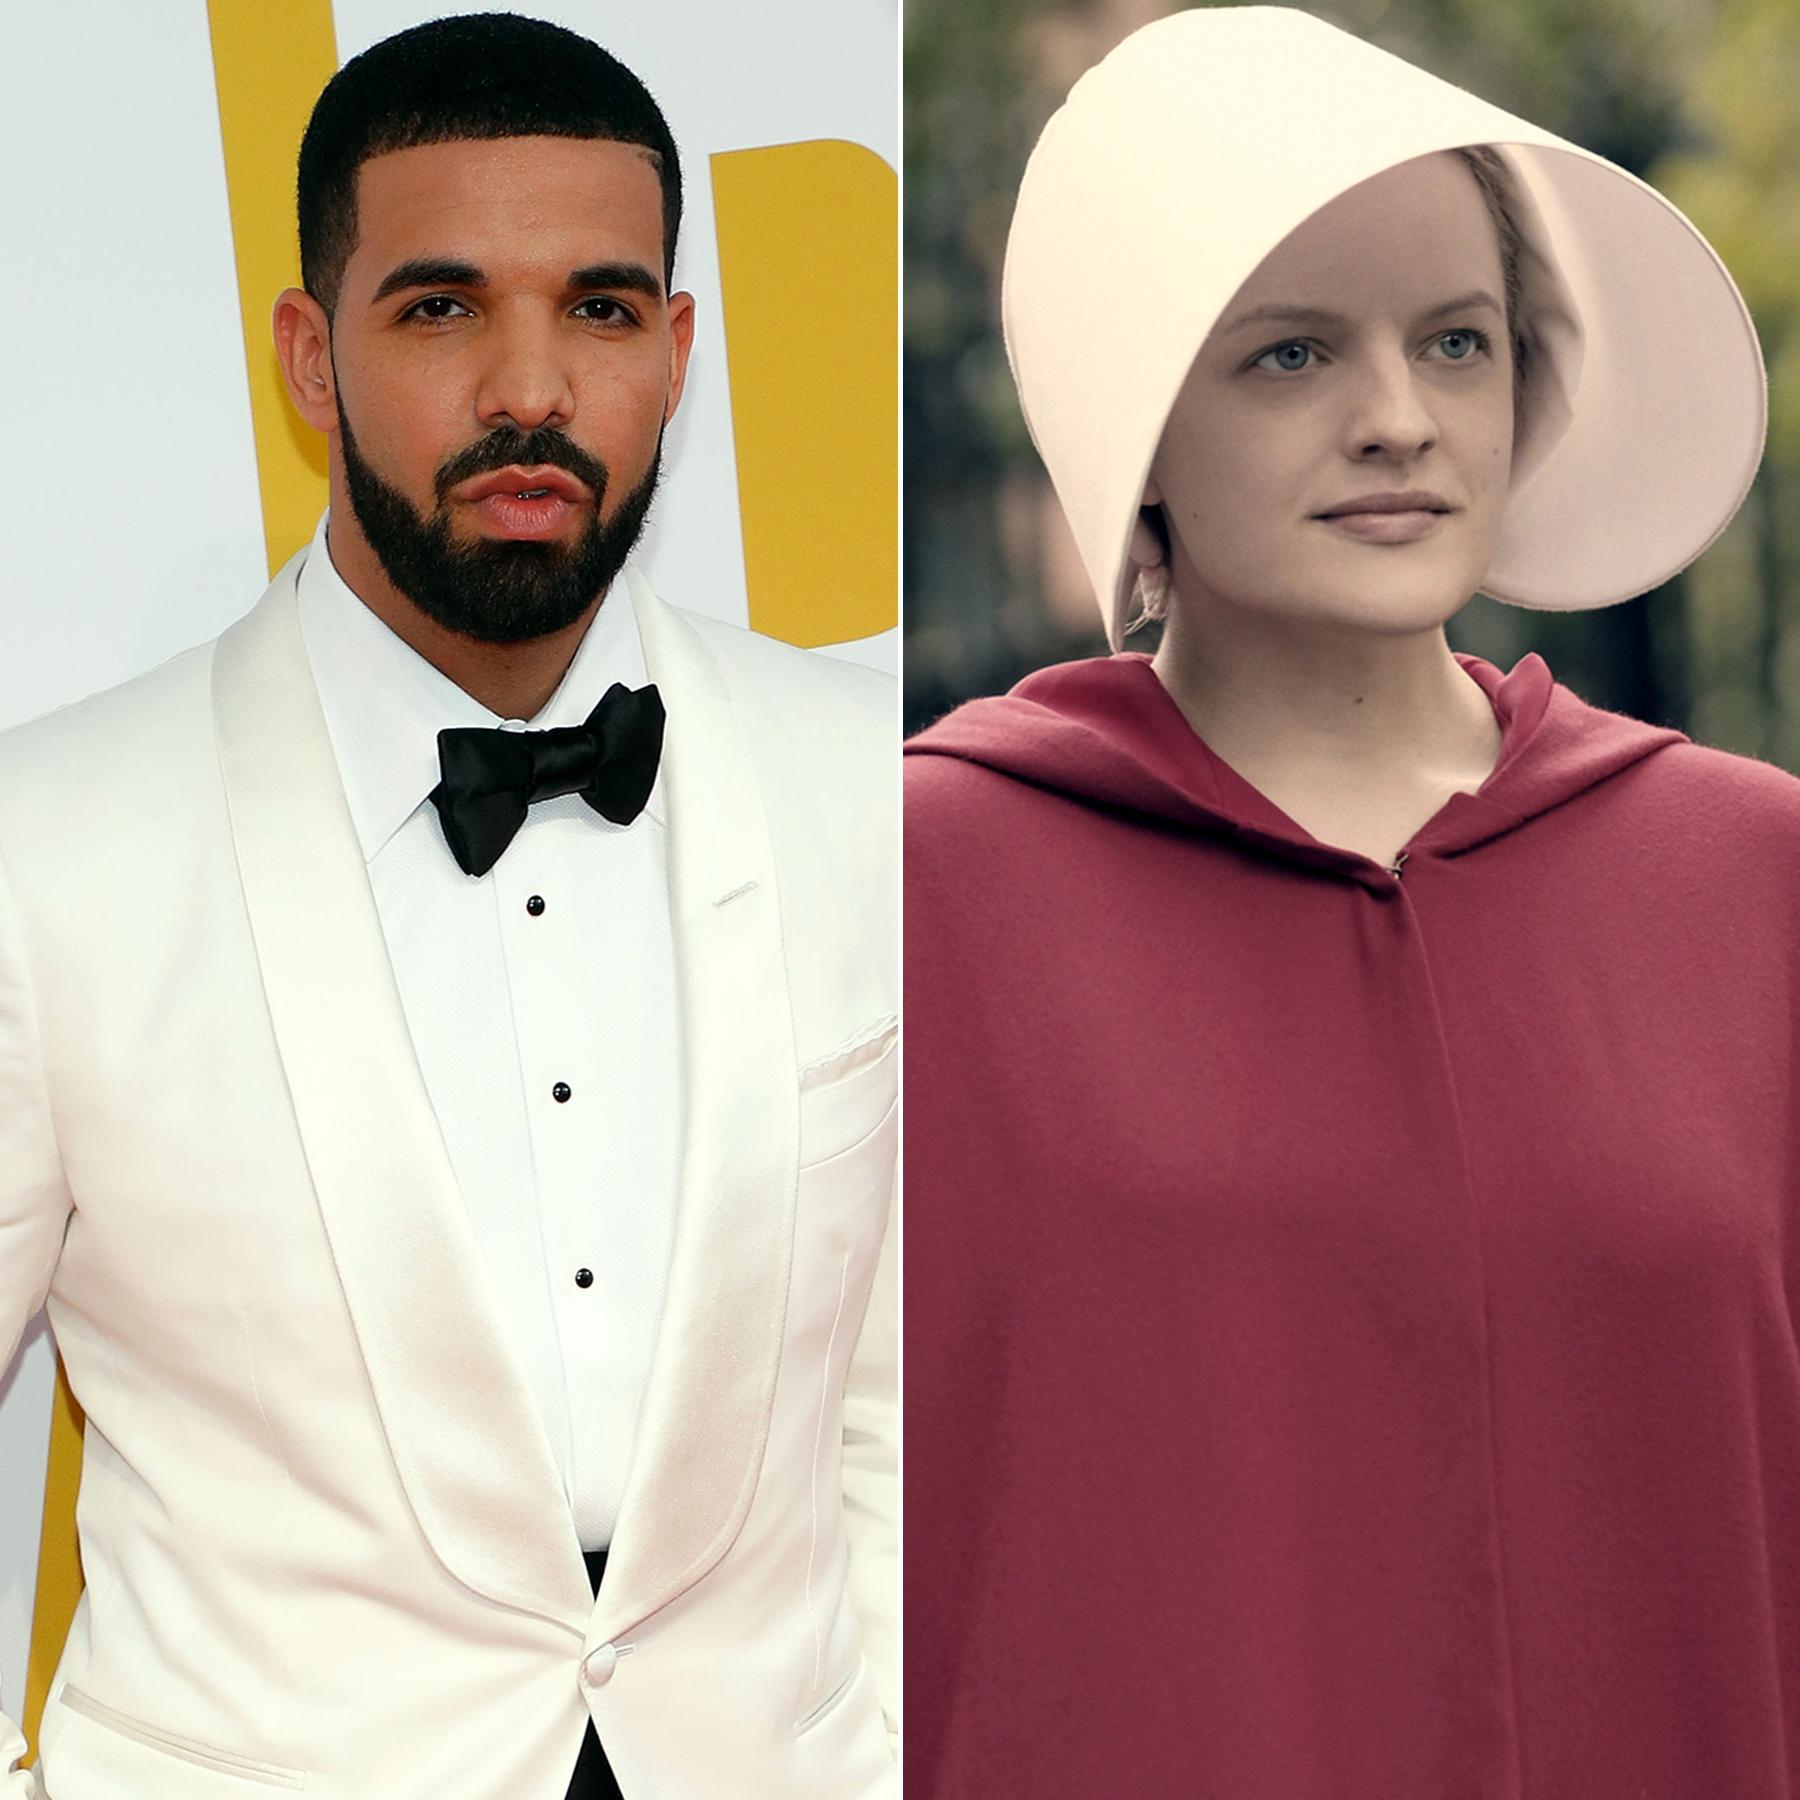 Drake/ The Handmaid's Tale